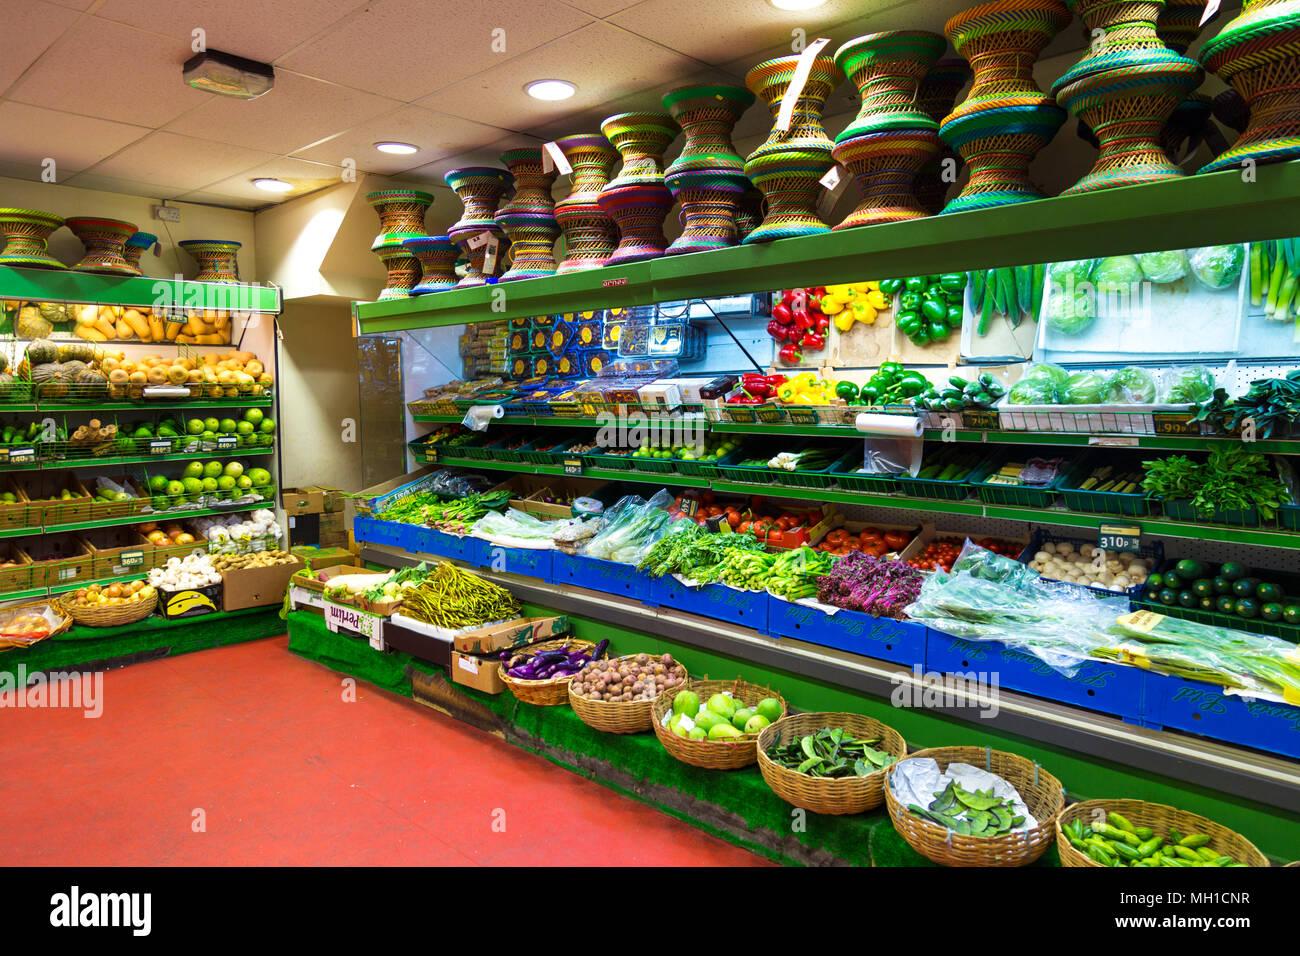 Interior of an oriental supermarket in Brick Lane, home to a big Bangladeshi community, London, UK - Stock Image